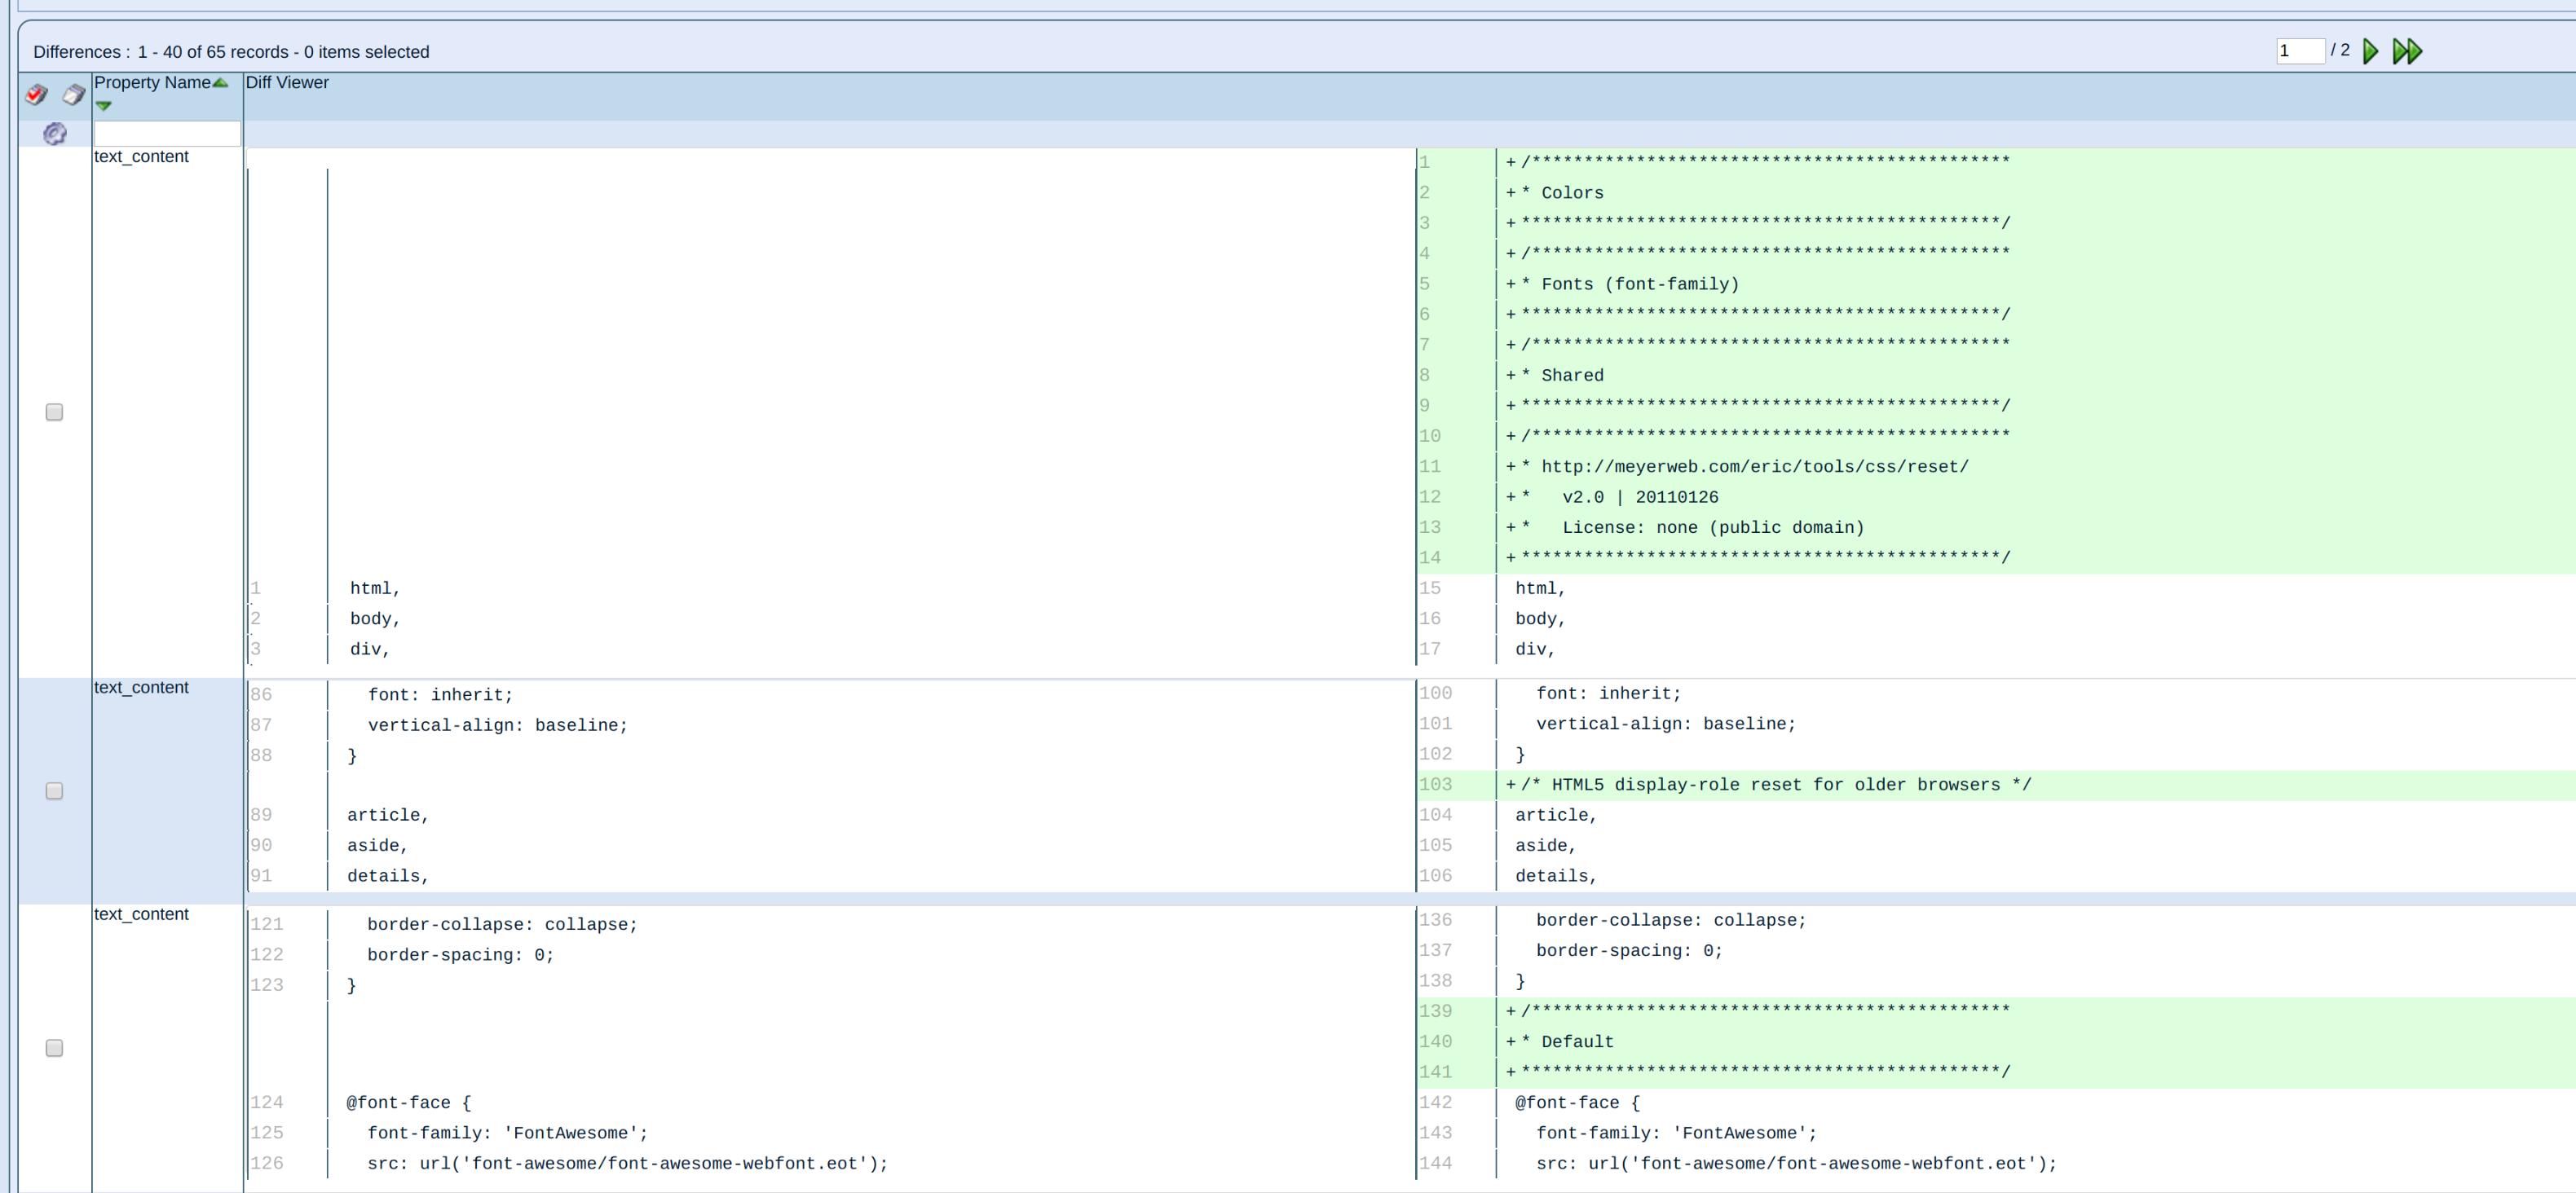 Screenshot_2018-06-14_at_2.08.36_PM